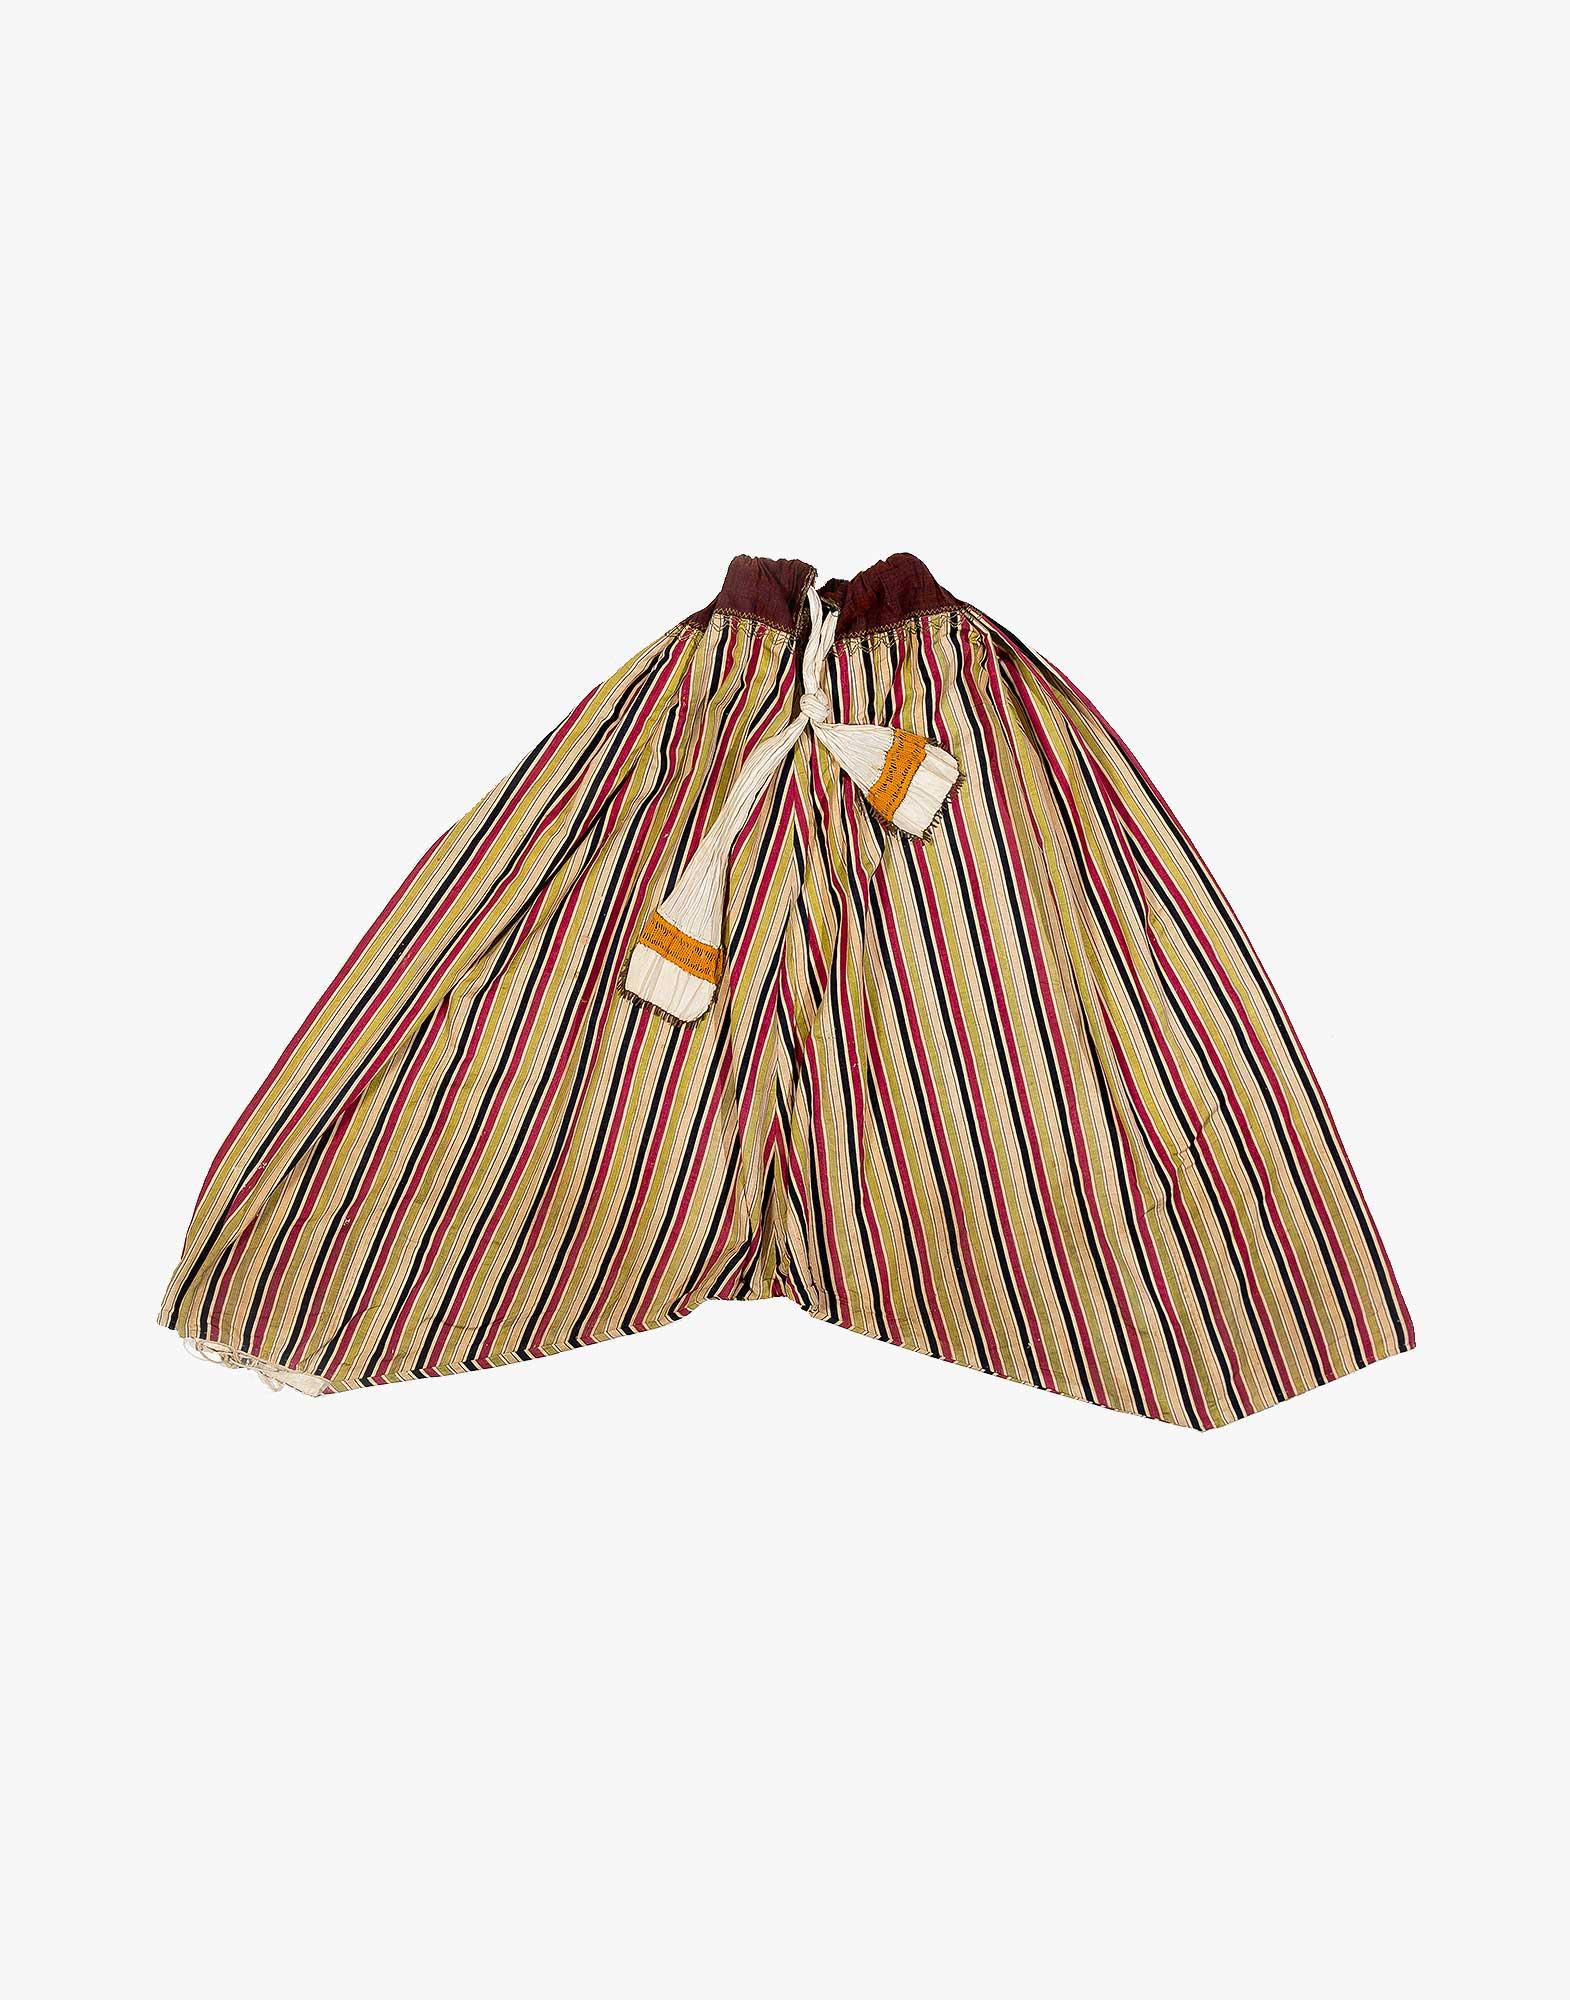 North West Anatolian Silk Ottoman Era Baggy Pants Shalwar